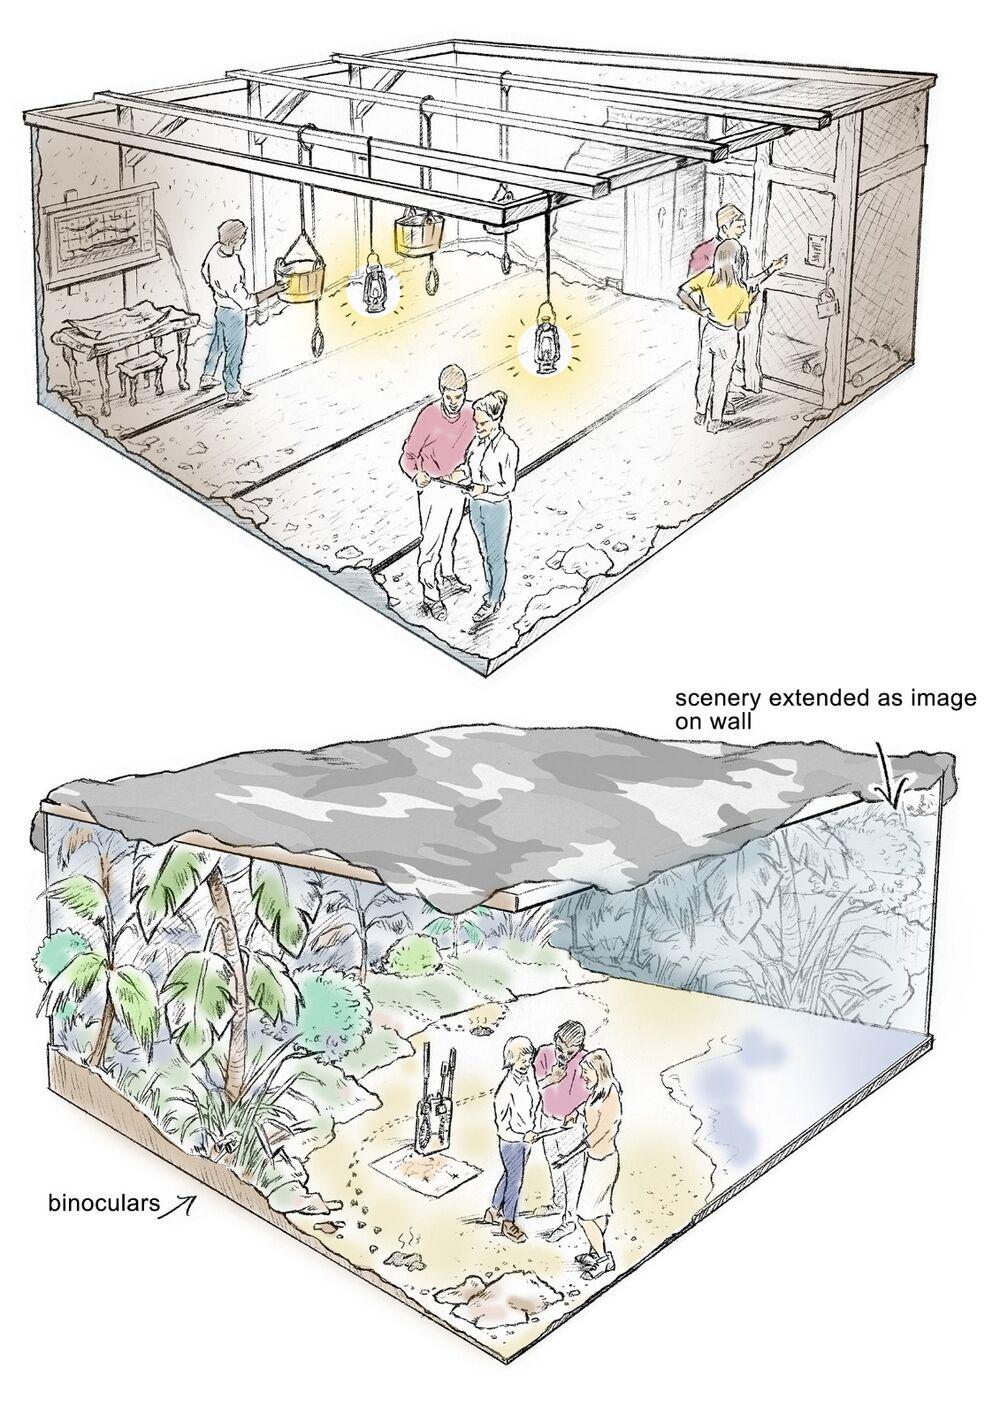 PencilRoughs_BearGrylls_SallyBarton_storyboards